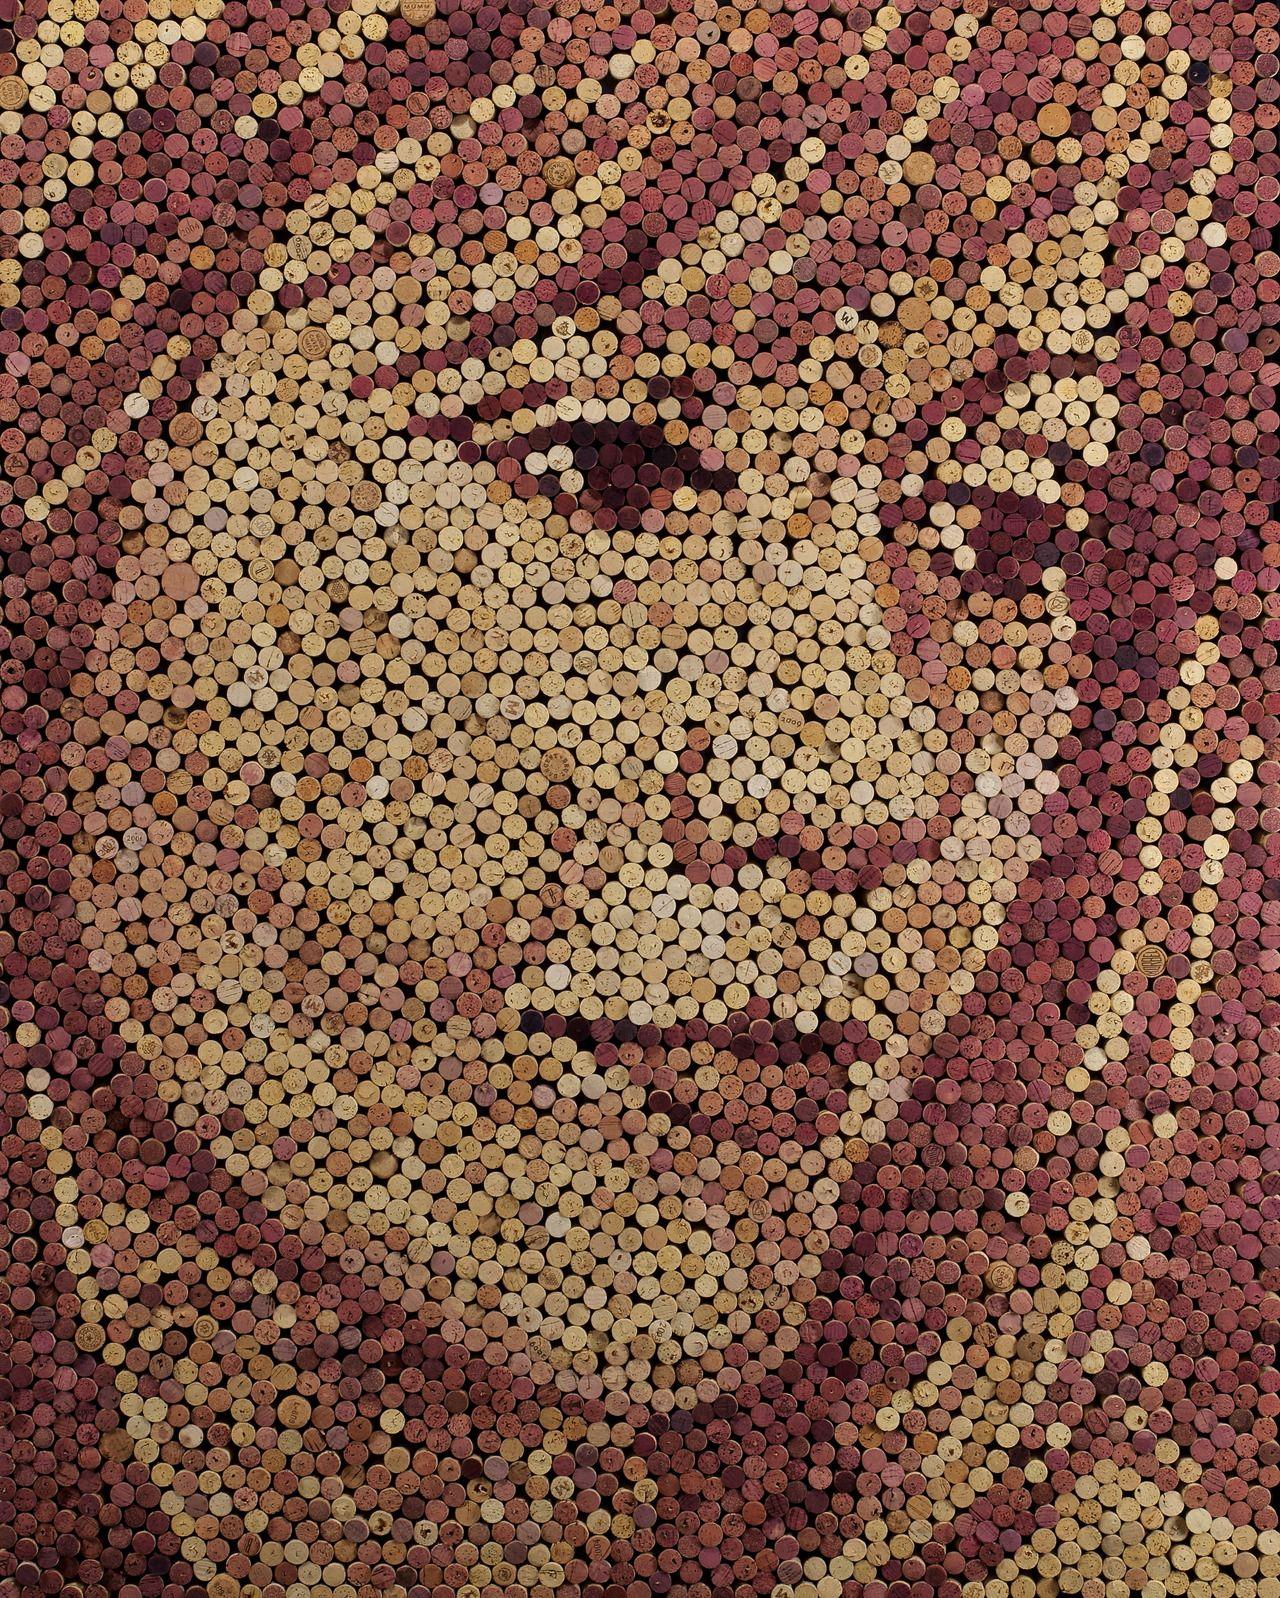 Portrait made out of wine corks, http://www.facebook.com/scottgundersen.art